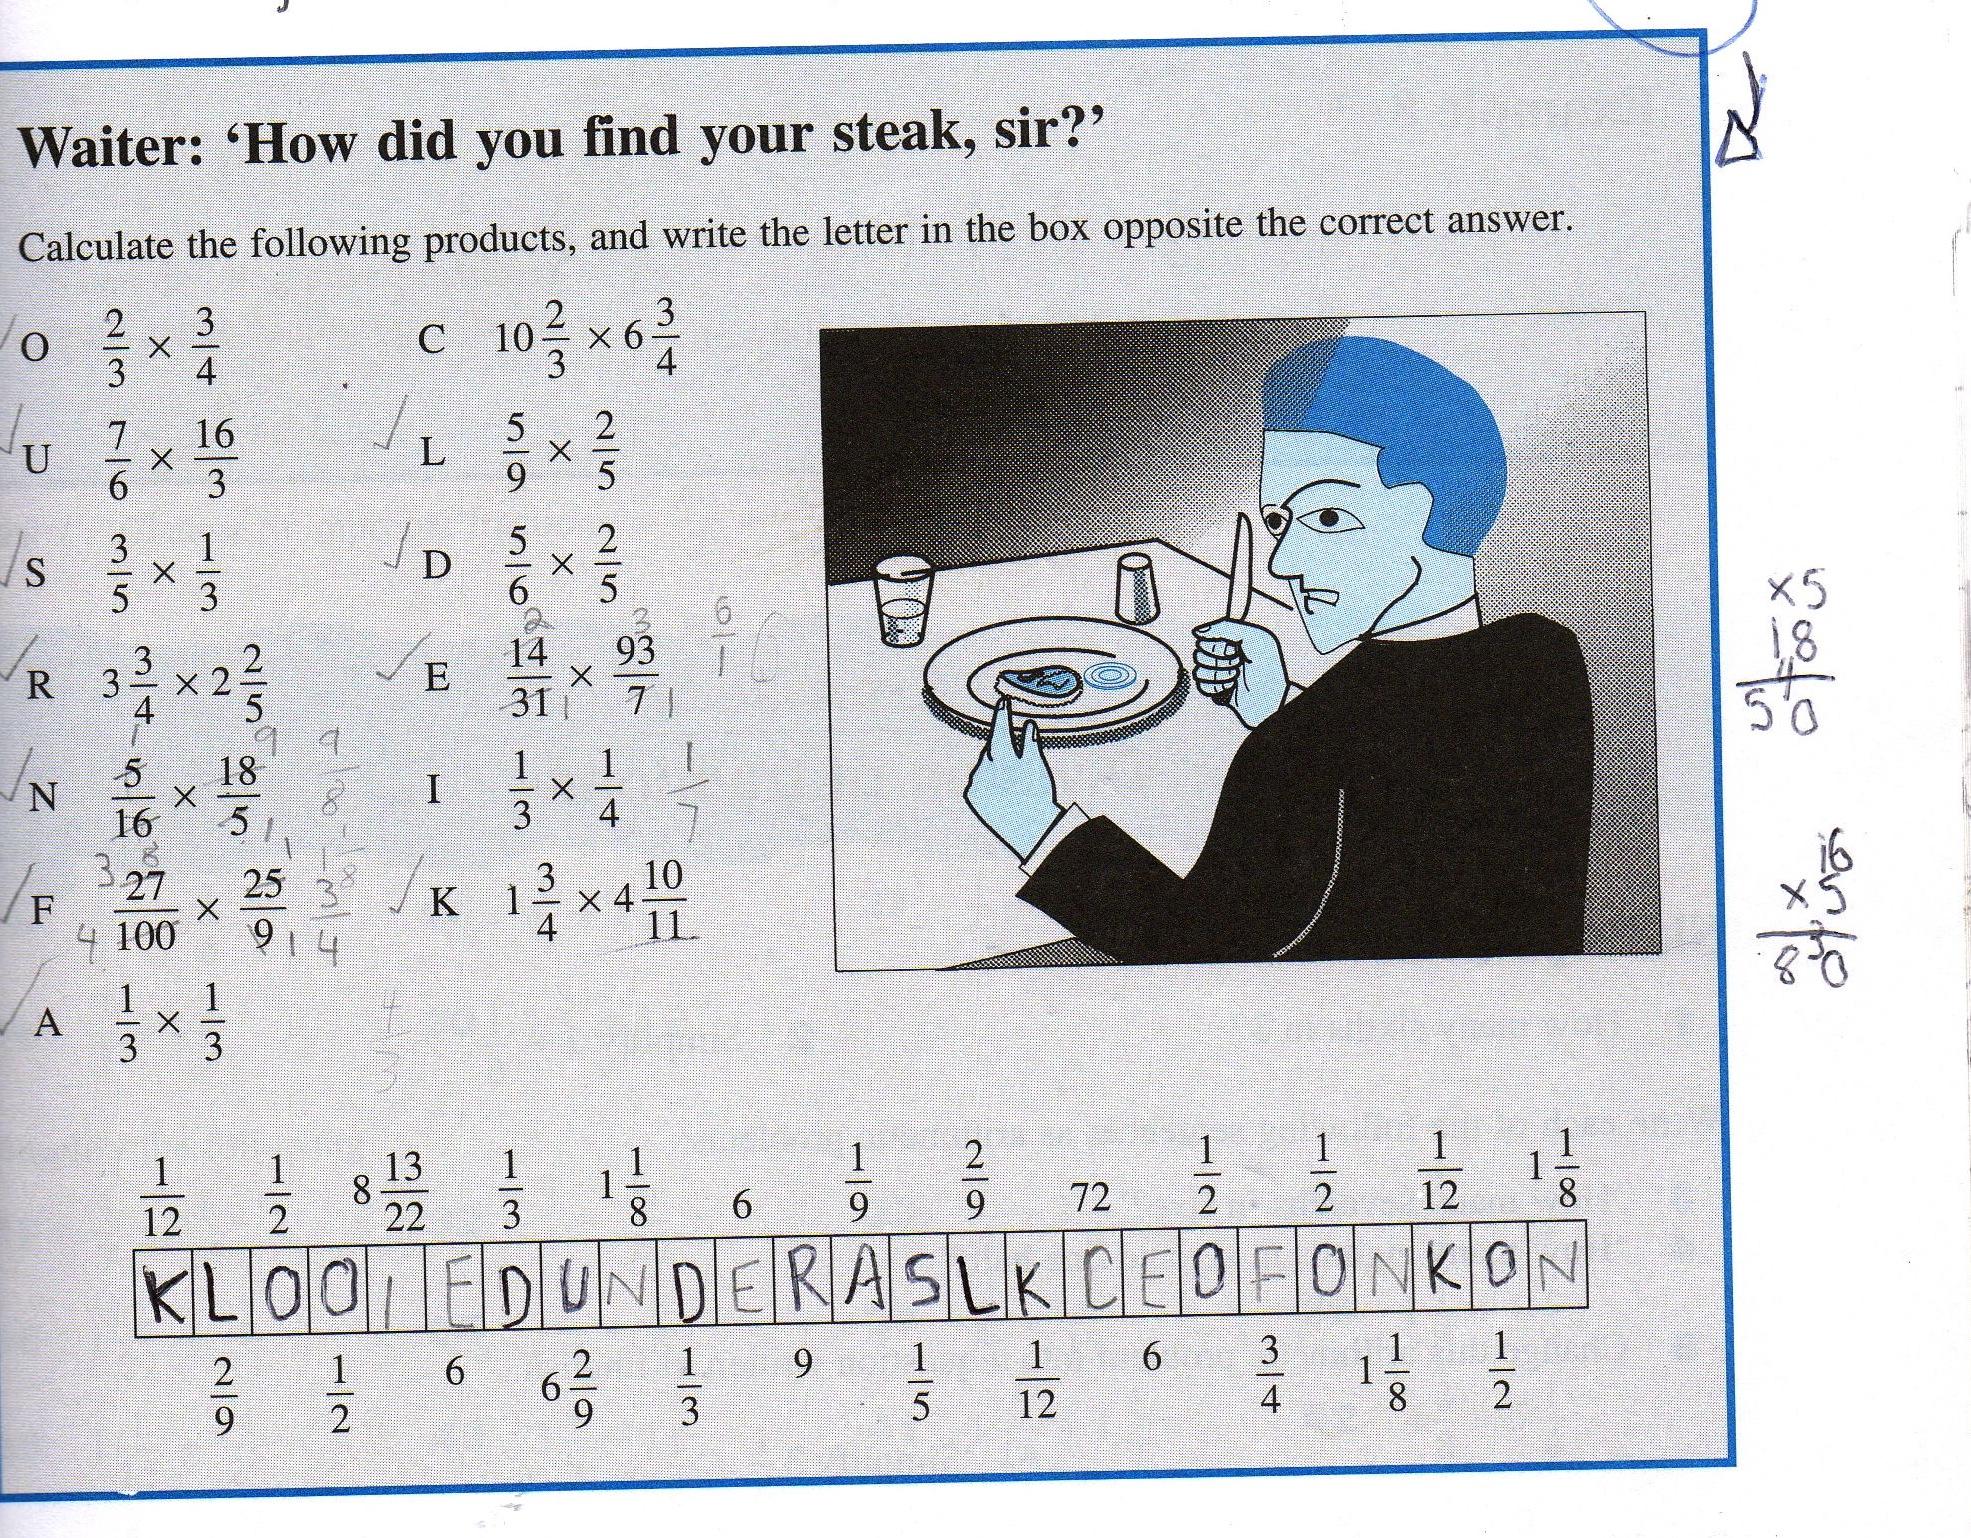 10 Dumbest Maths Questions